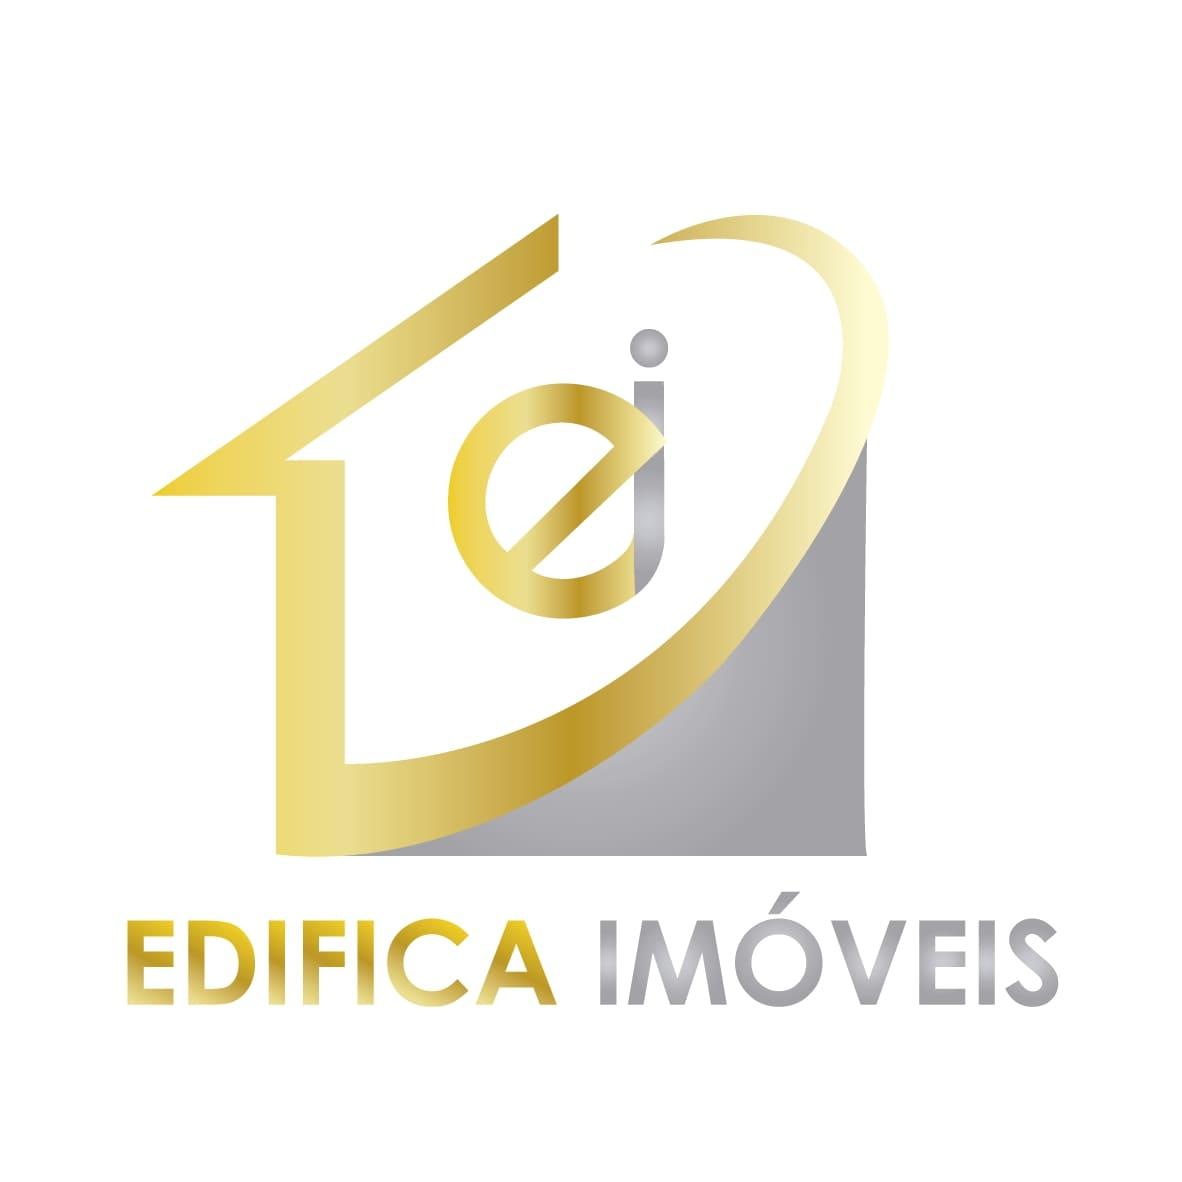 EDIFICA IMOVEIS